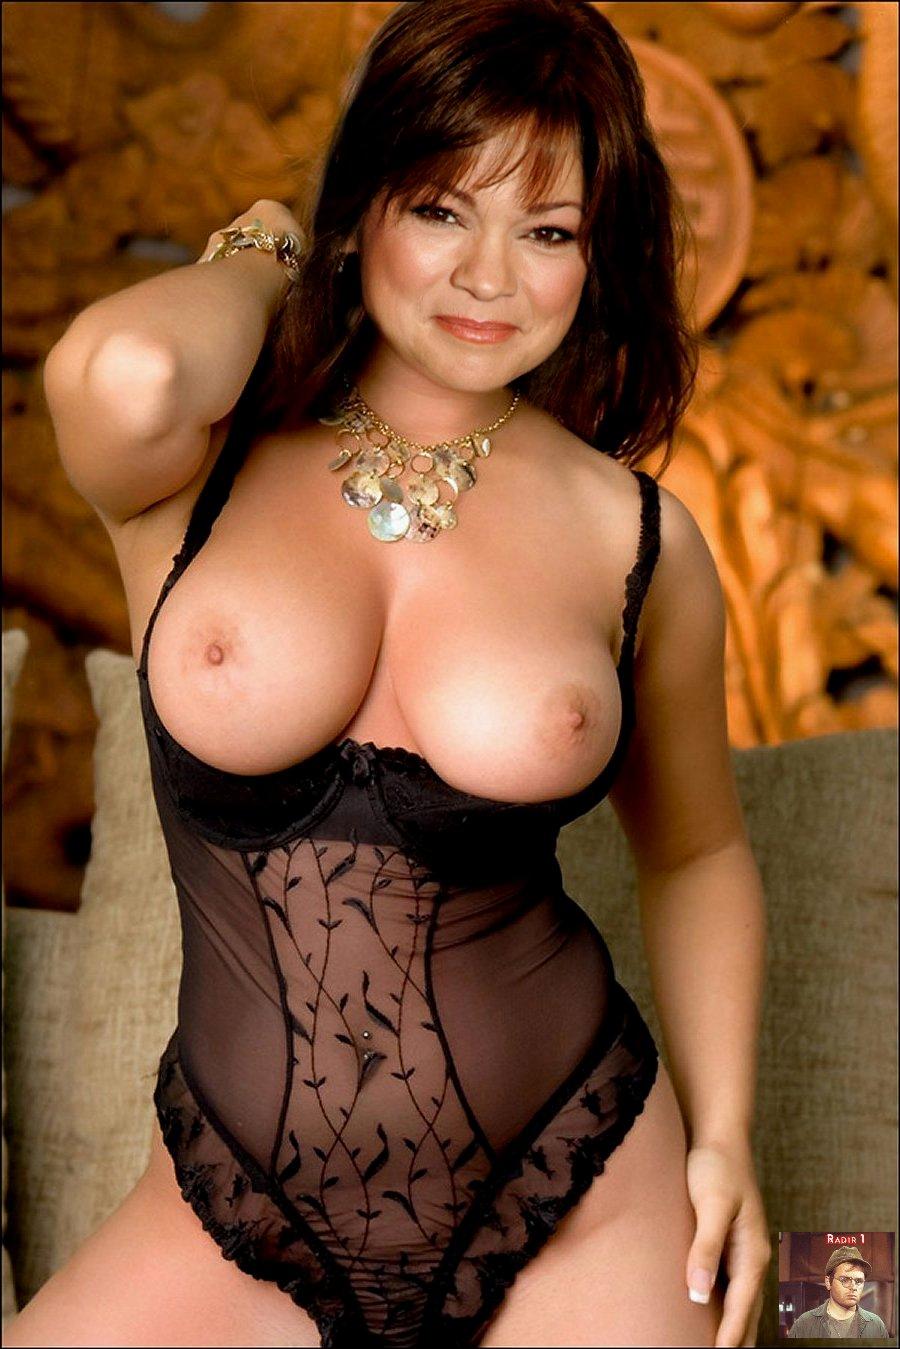 Nude girl with german shepherd porn